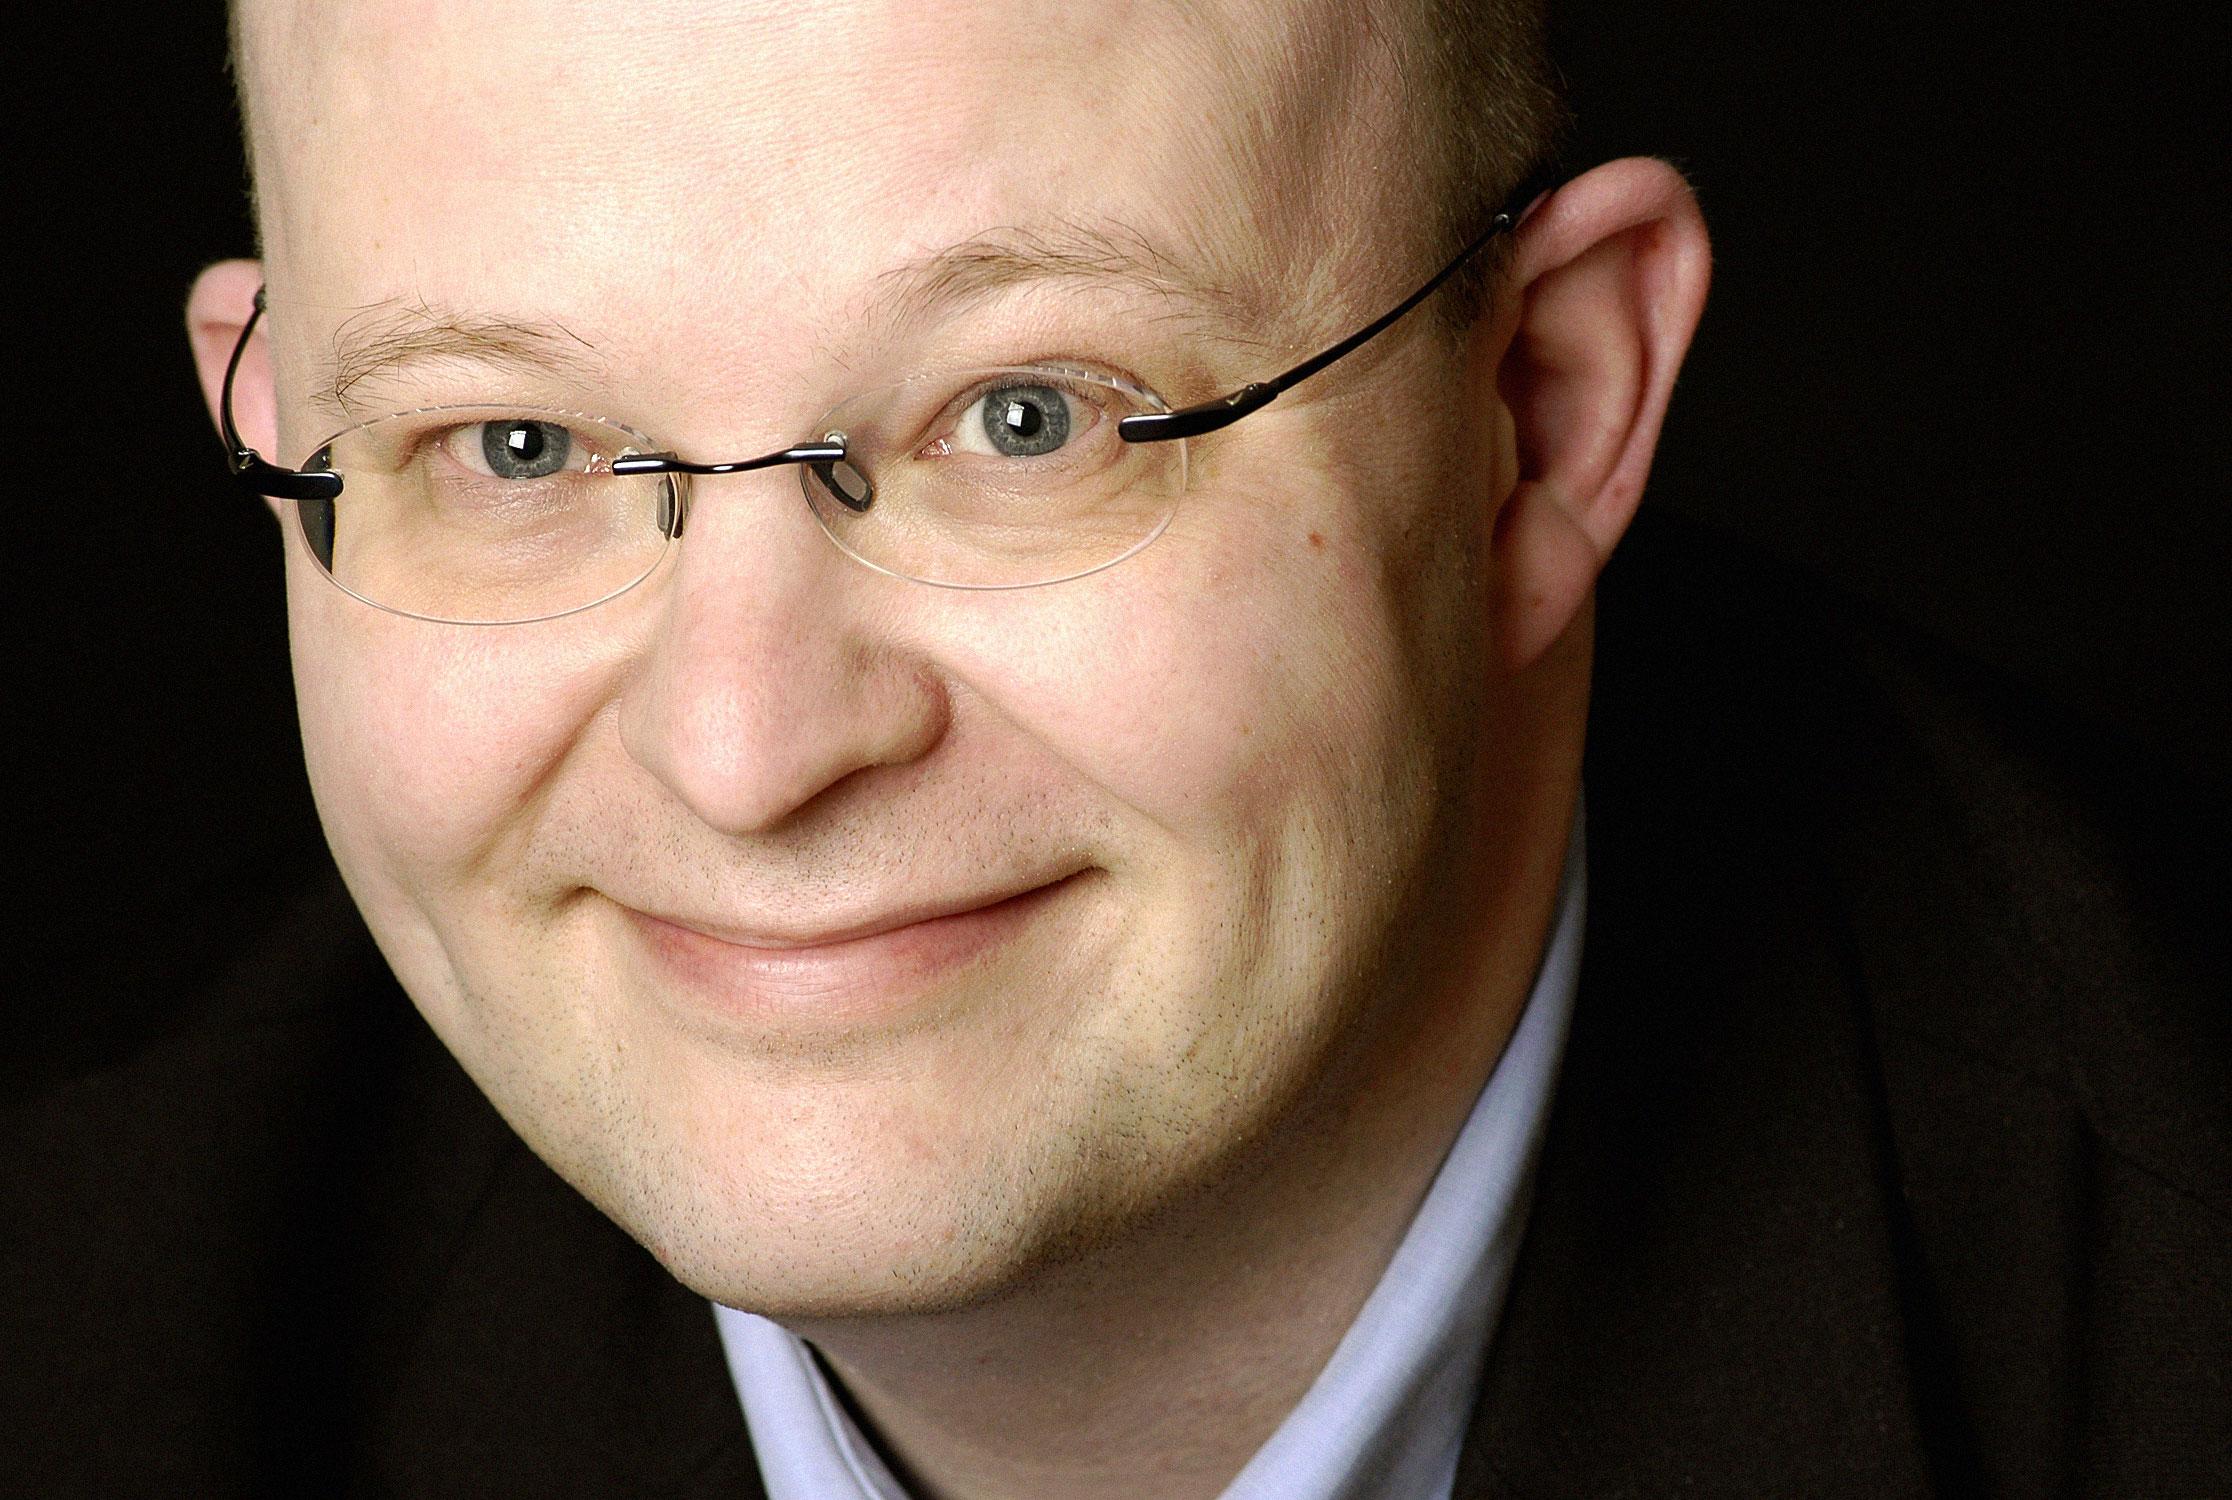 Rechtsanwalt Dirk Tholl